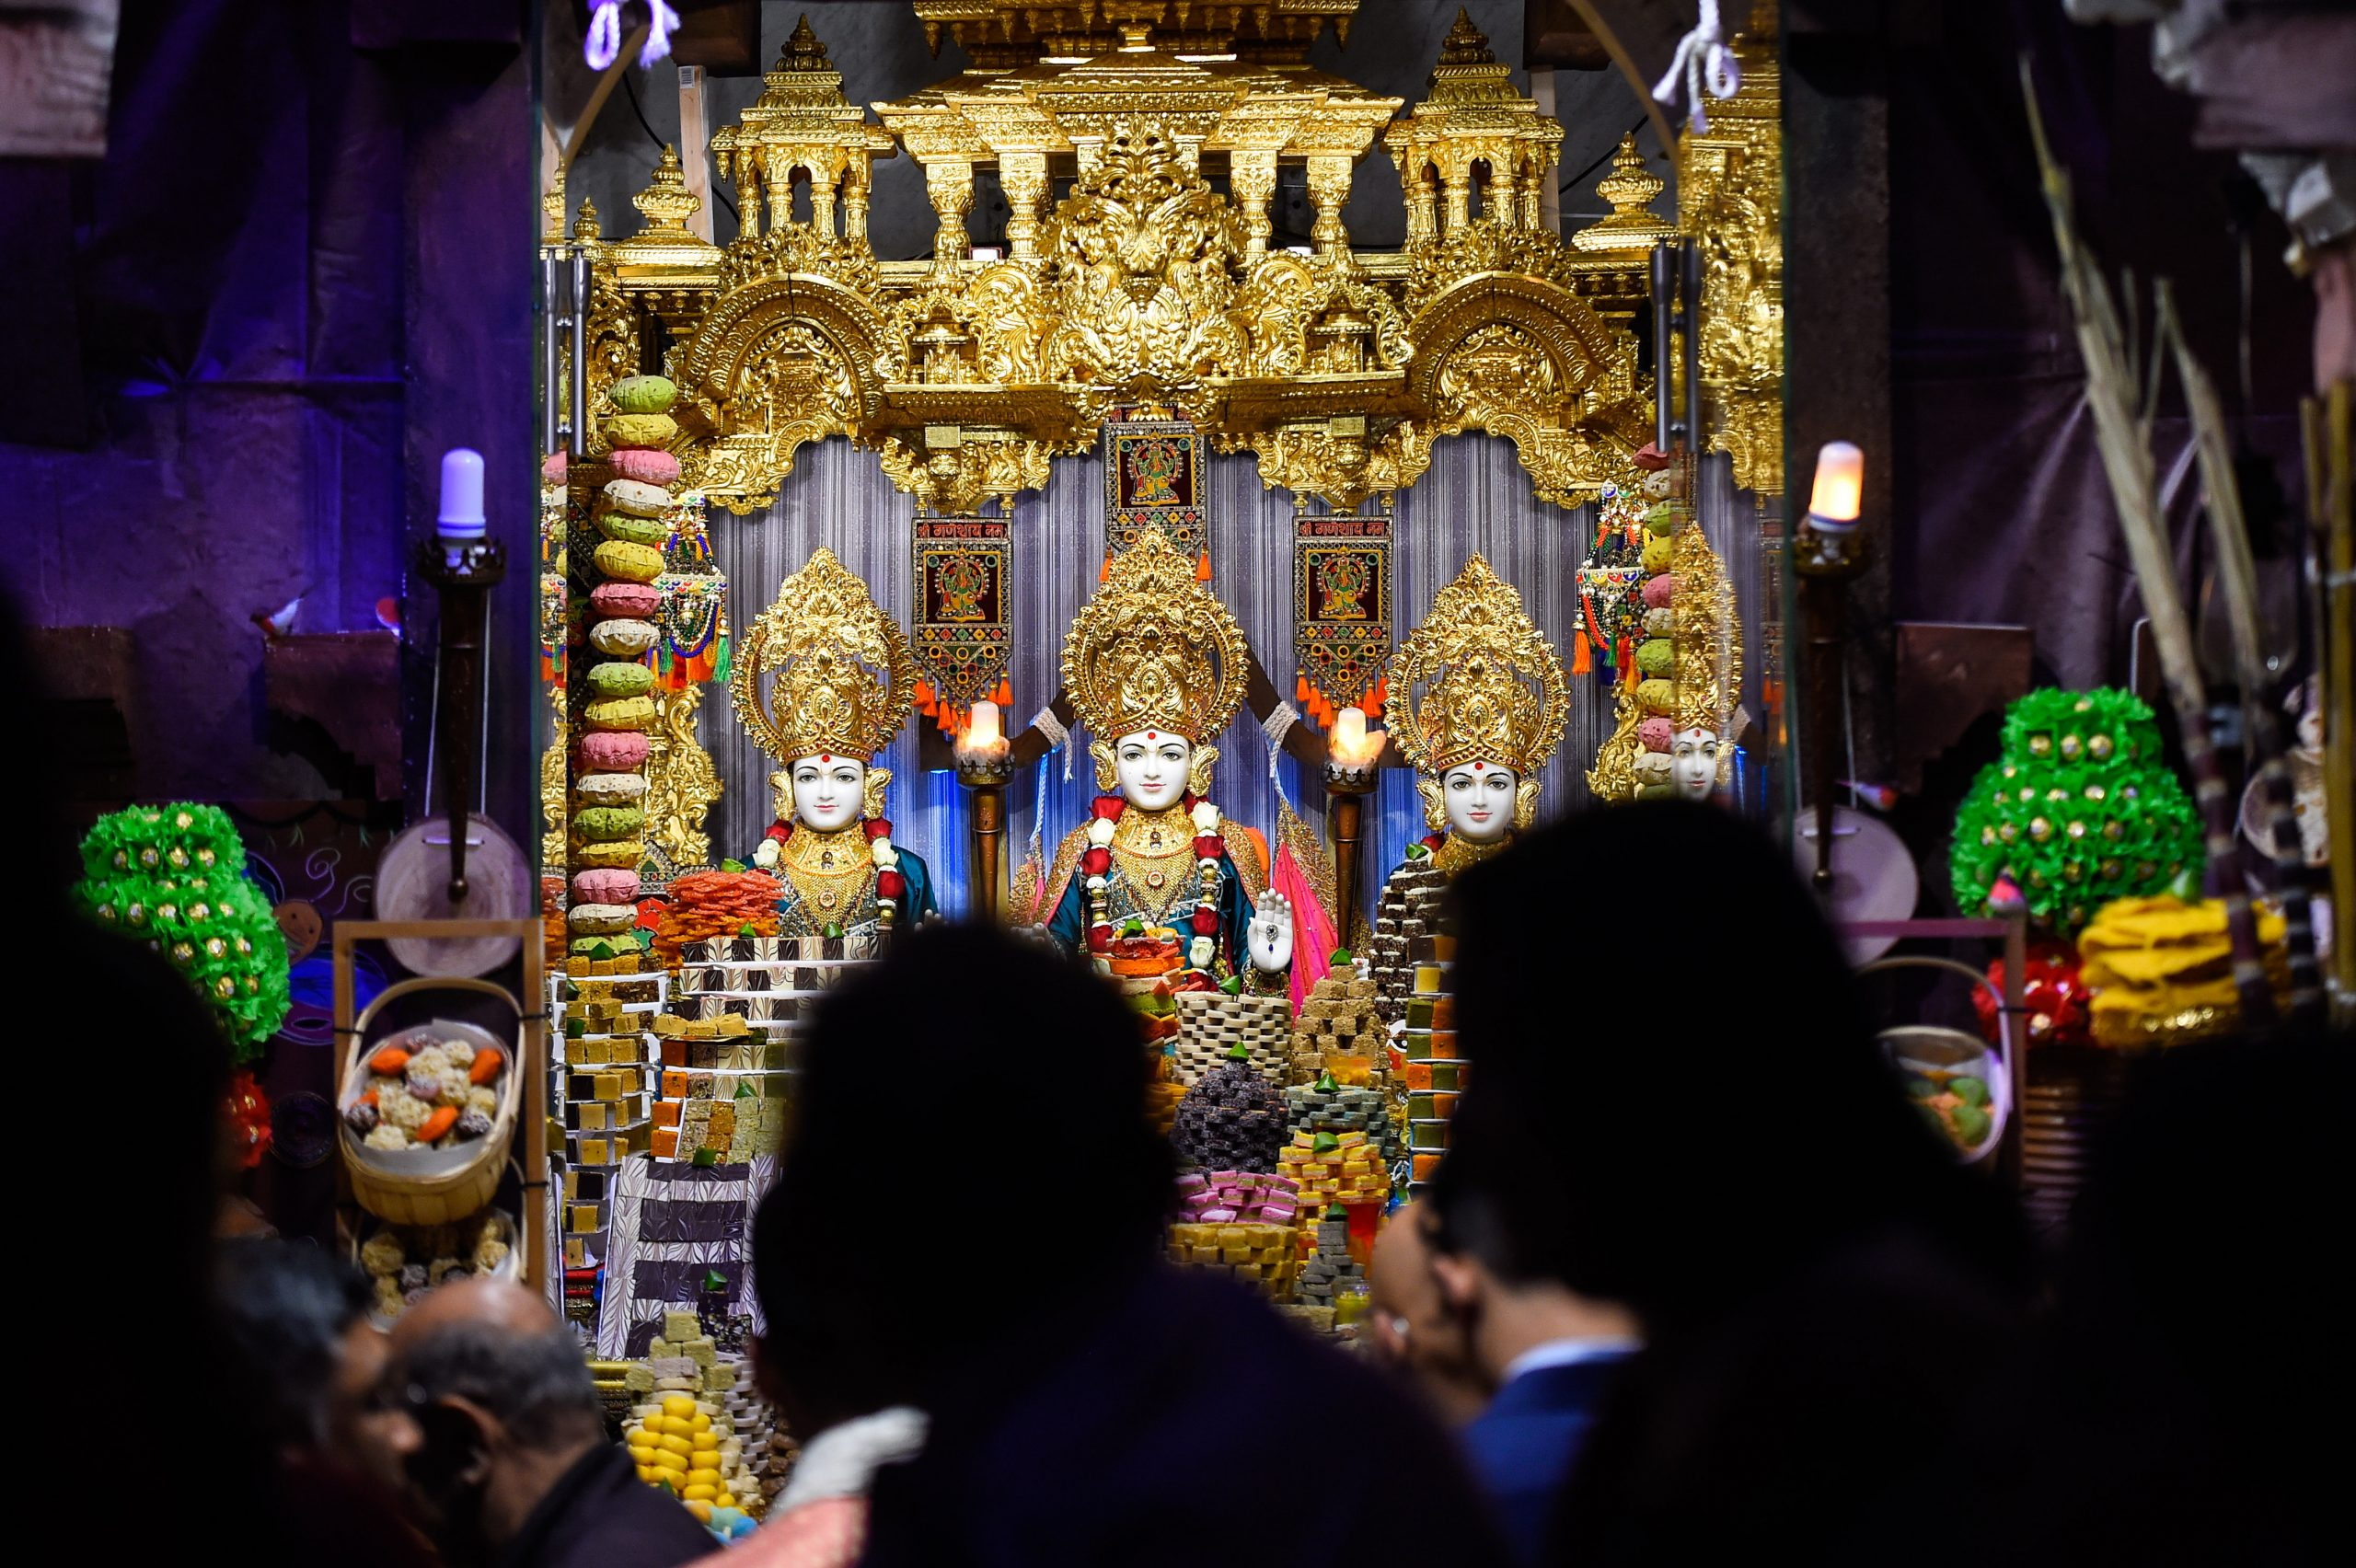 FILE PHOTO: Diwali celebrations at BAPS Shri Swaminarayan Mandir in London, England. (Photo by Peter Summers/Getty Images)